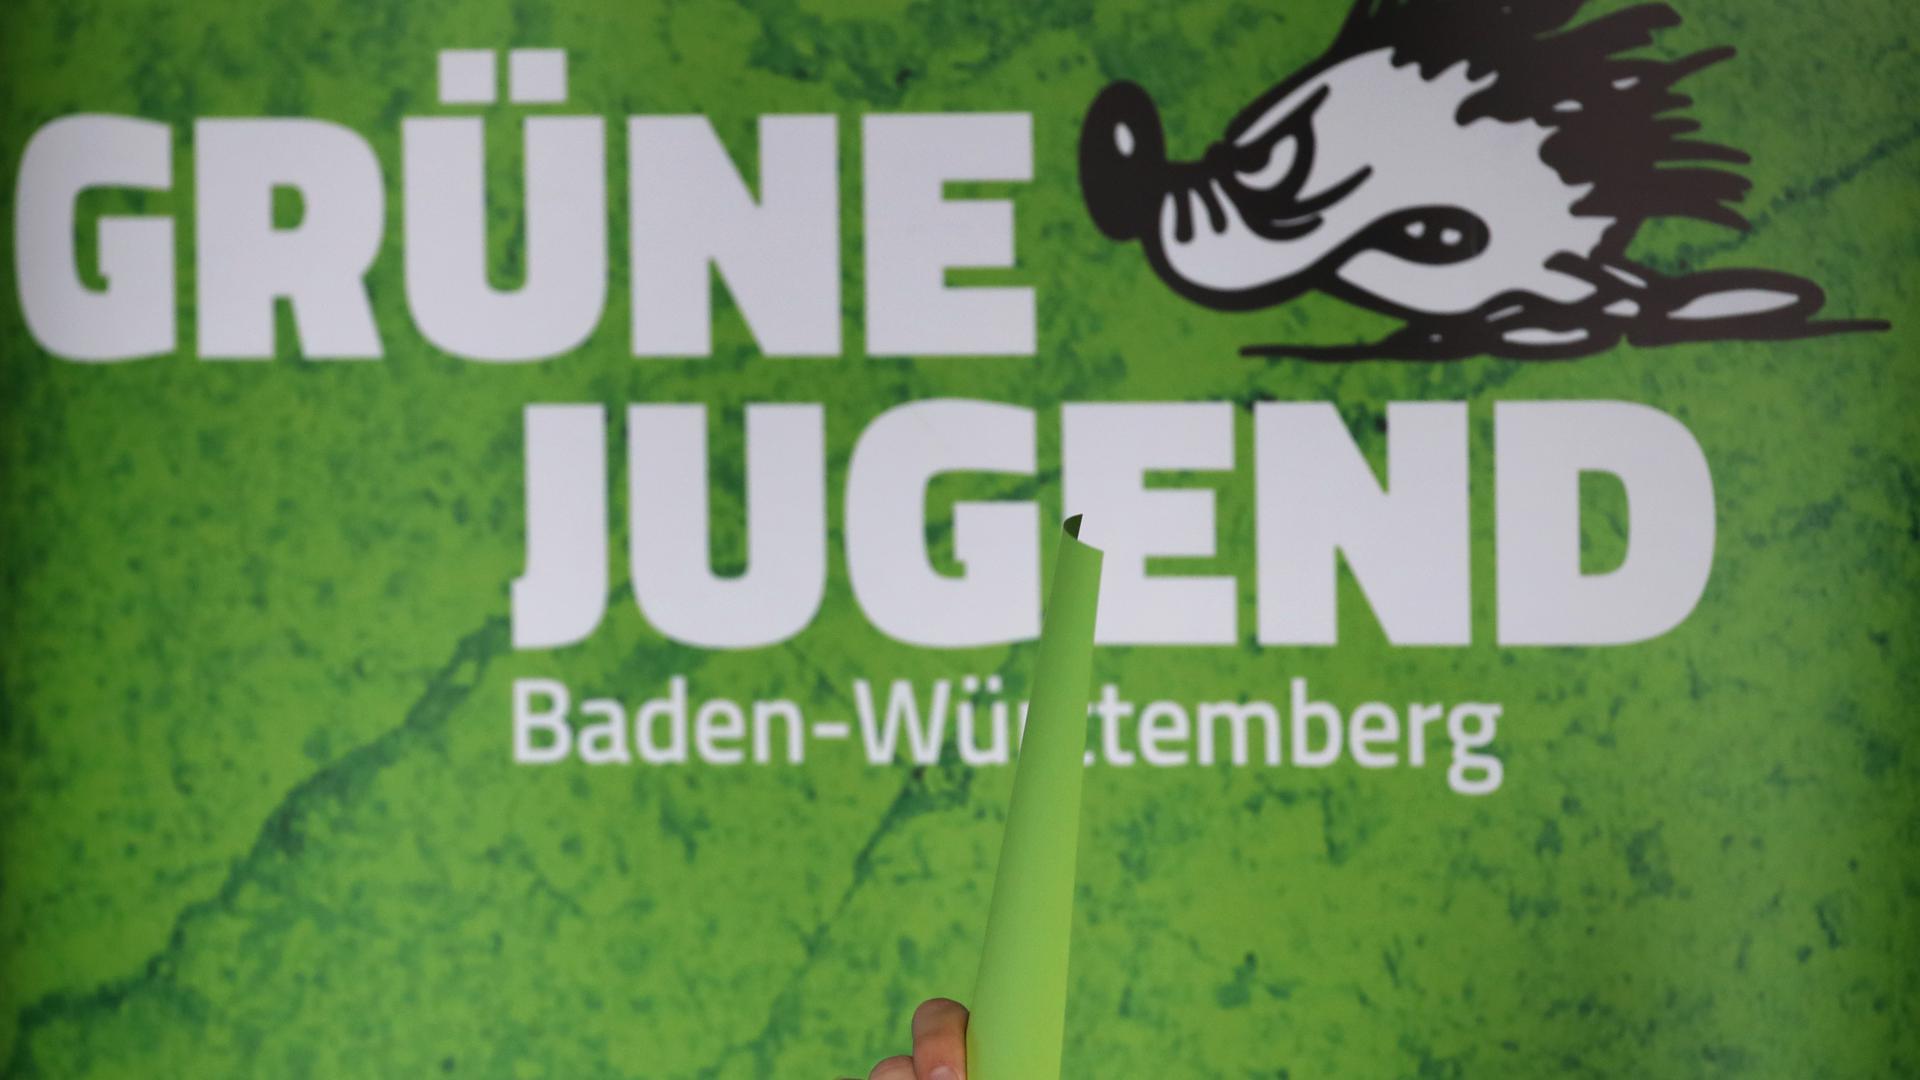 Ein Plakat der Grünen Jugend Baden-Württemberg